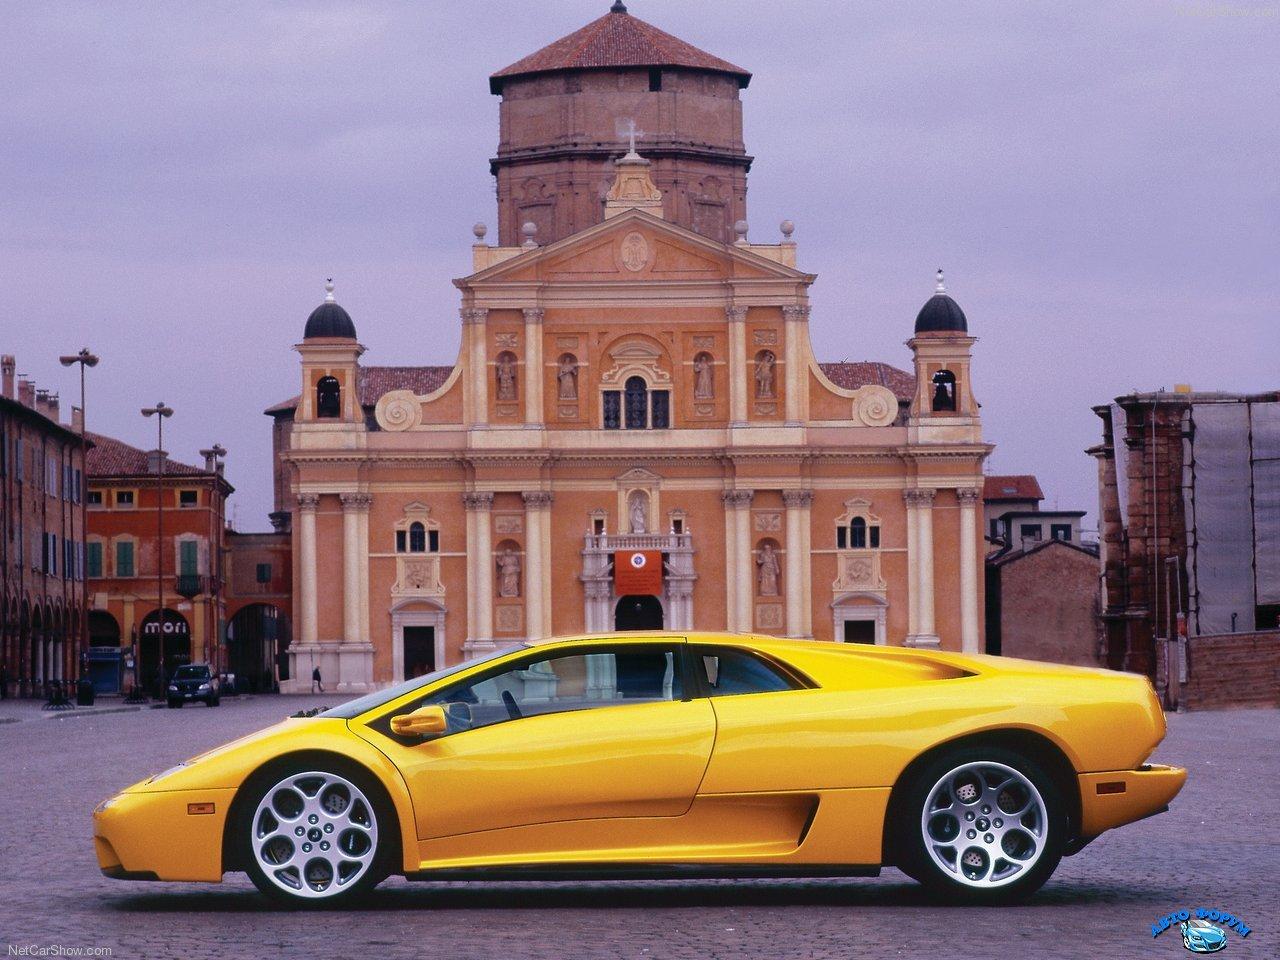 Lamborghini-Diablo_6.0_2001_1280x960_wallpaper_05.jpg